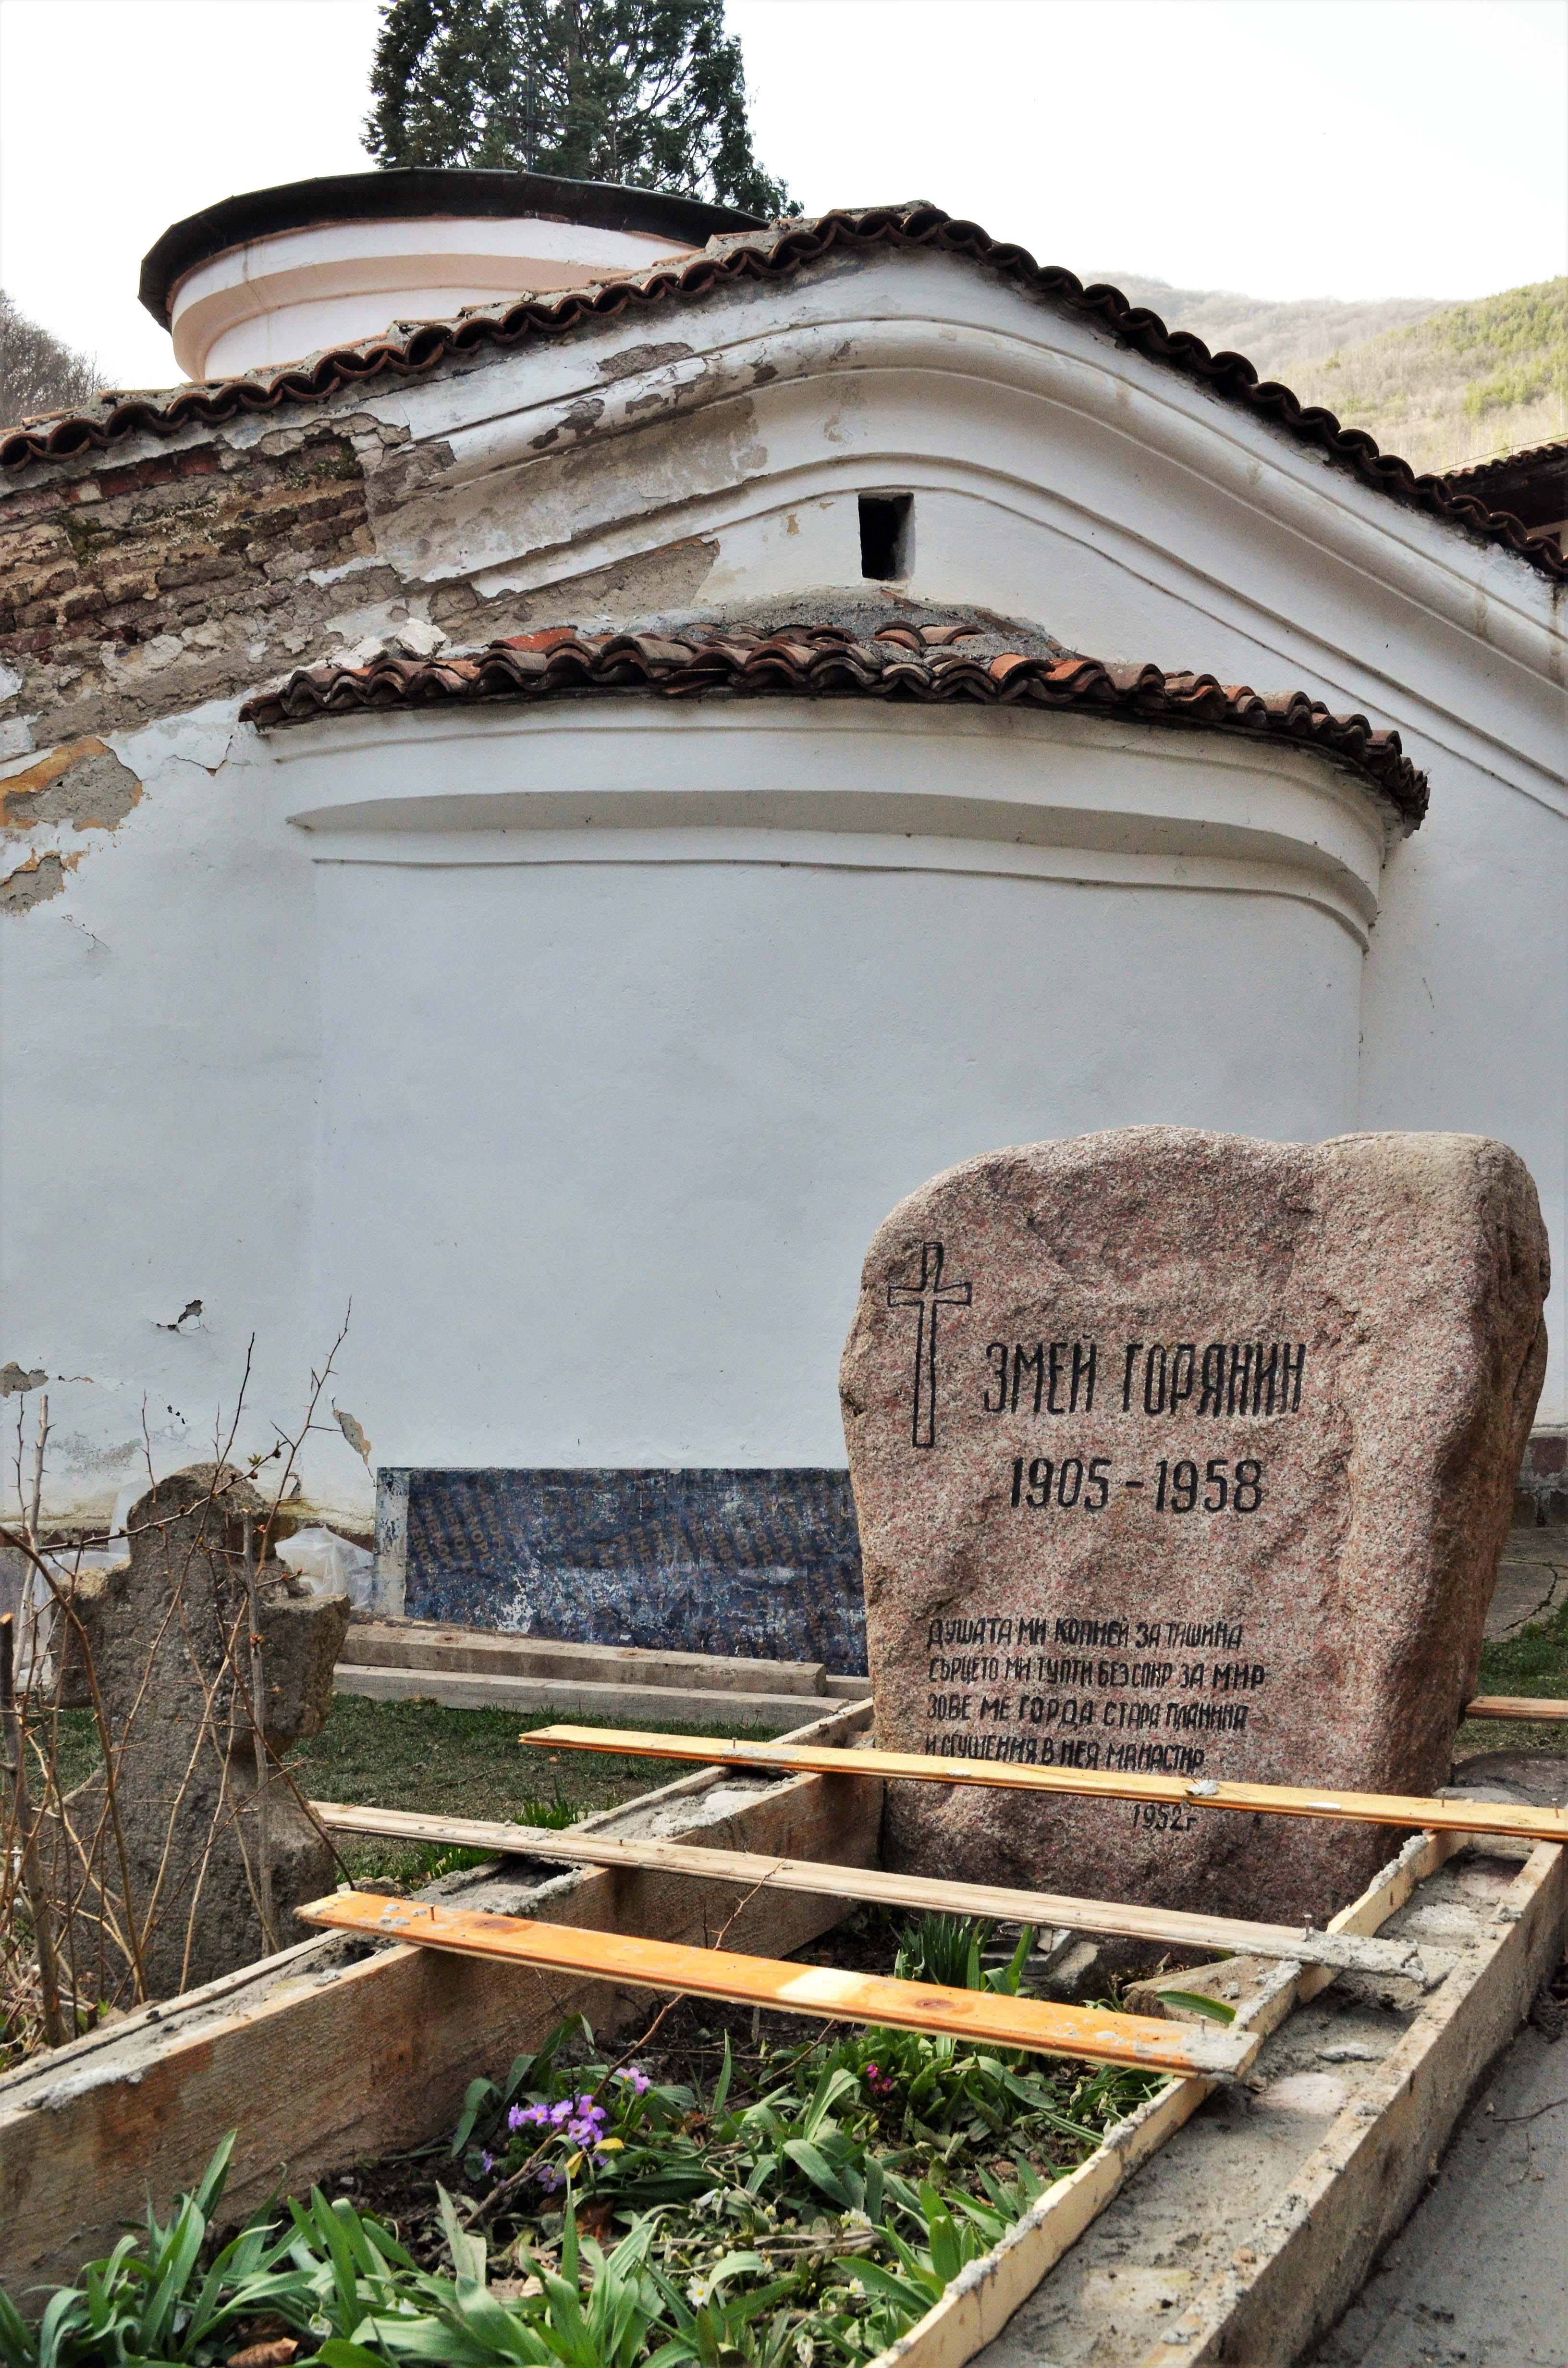 Гробът на Змей Горянин